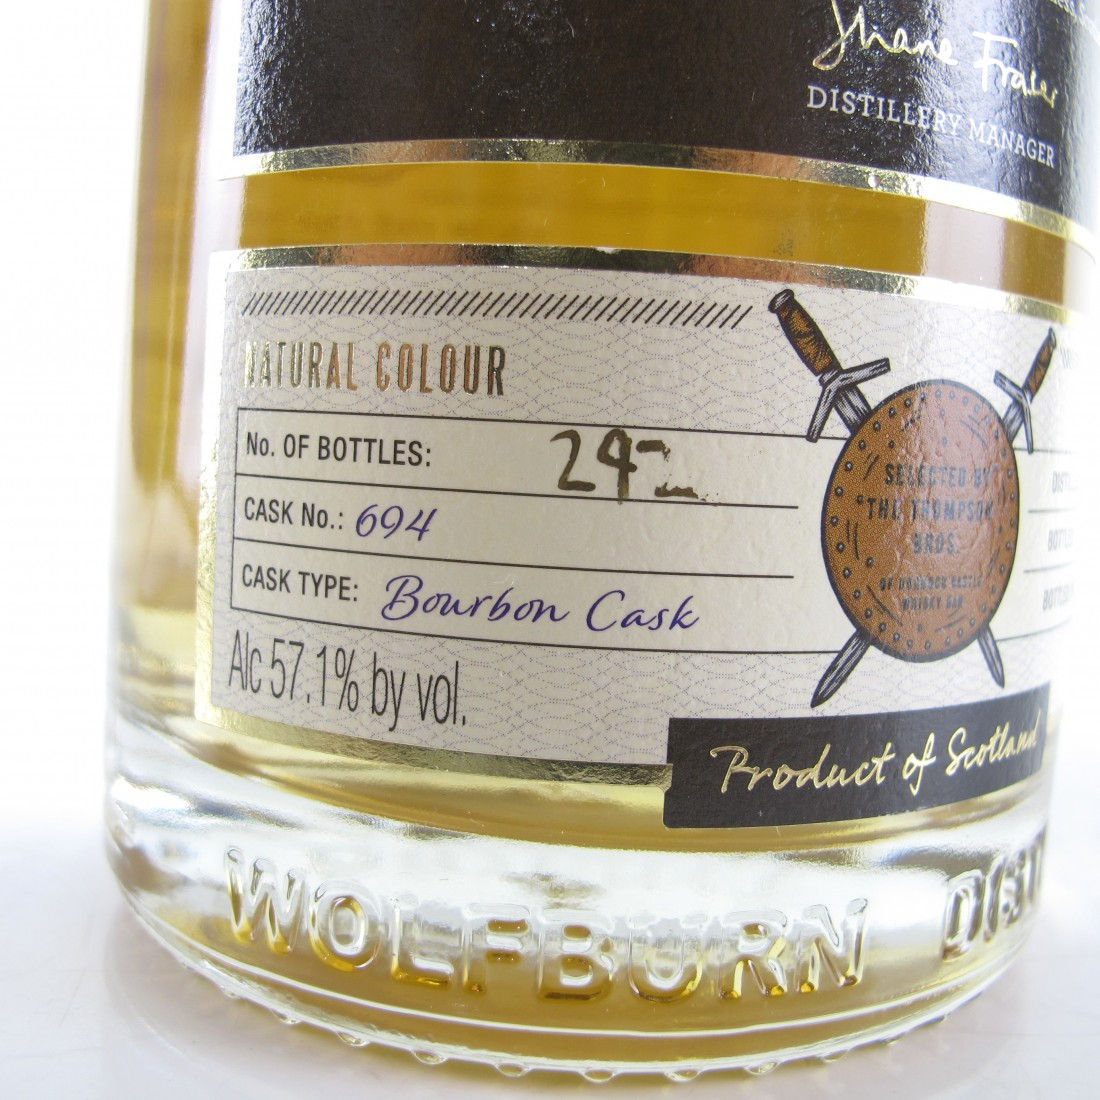 Wolfburn 2014 Private Bottling / Dornoch Castle